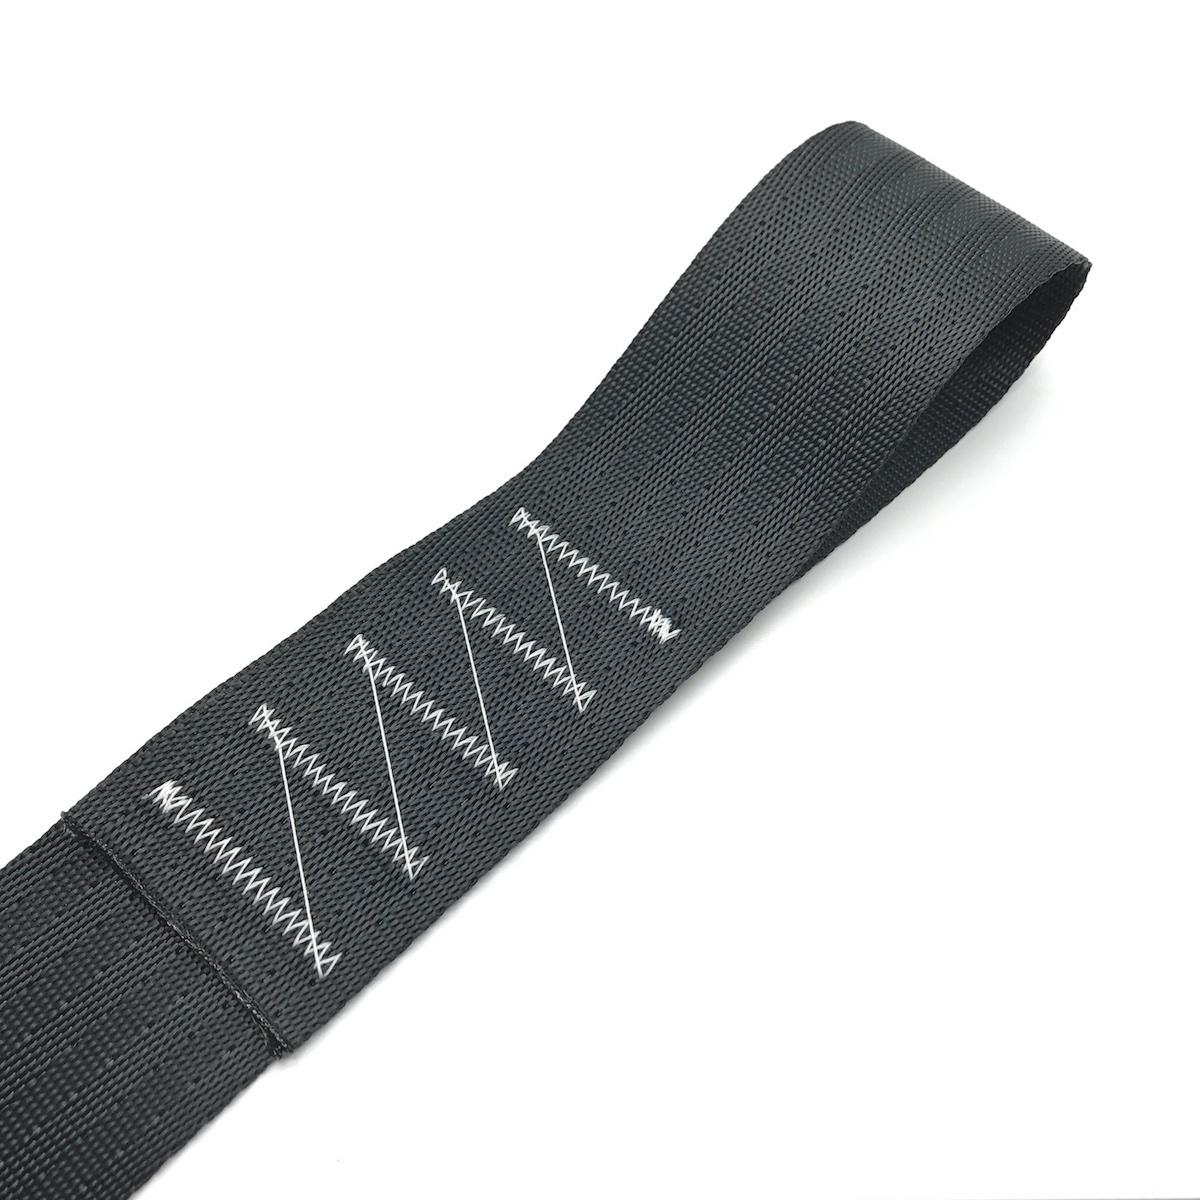 1 5 Webbing Straps